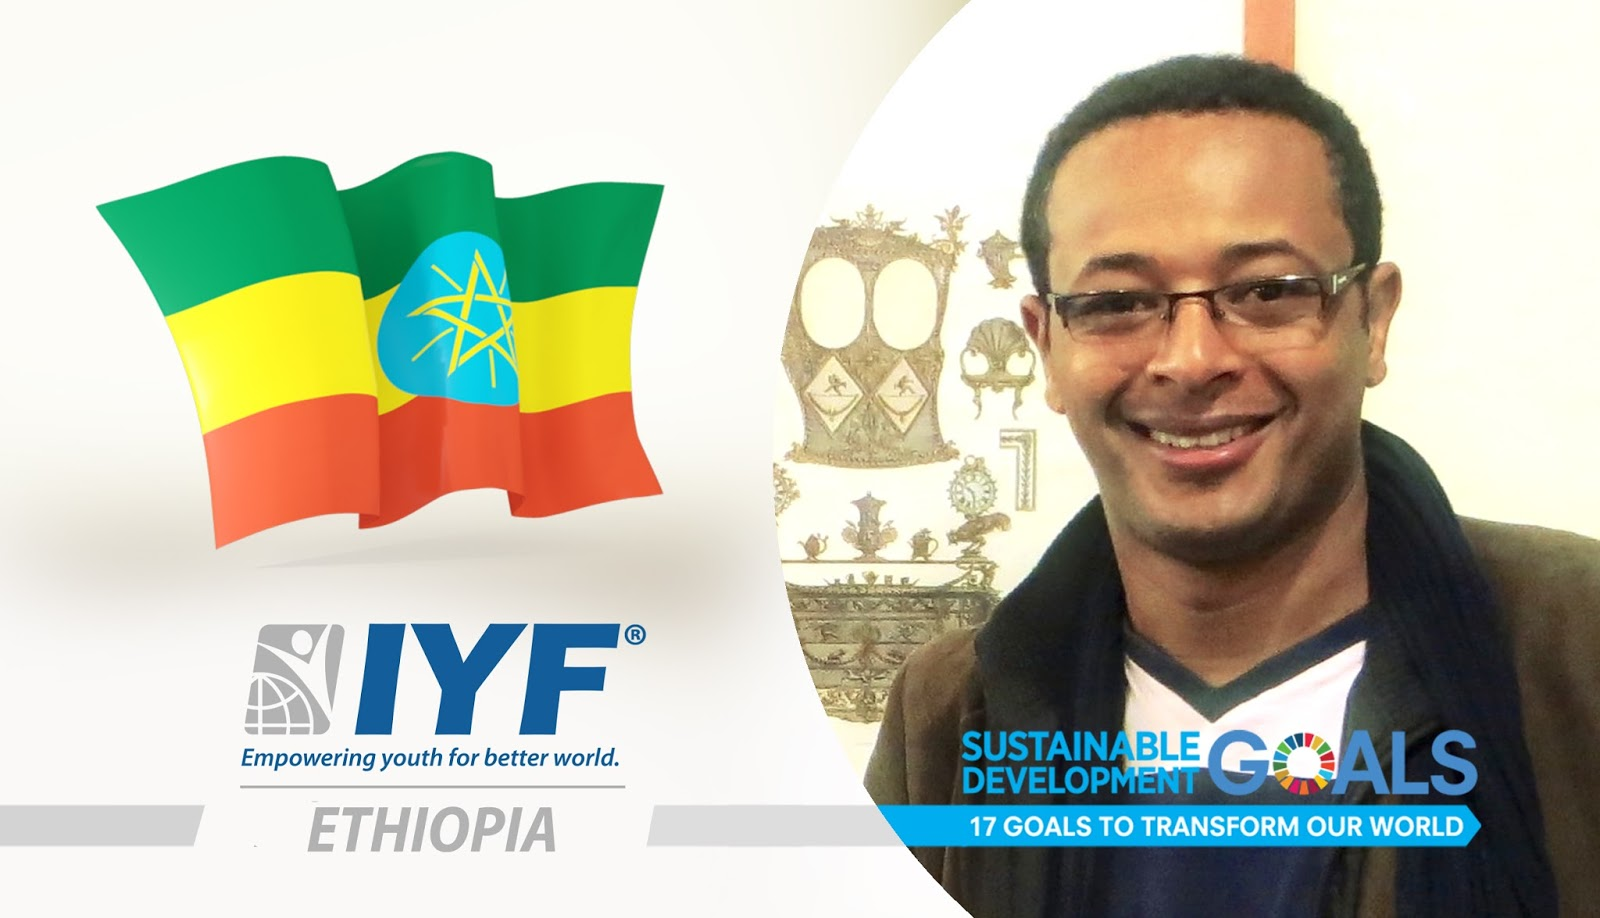 Kidus Mehalu, IYF Representative in Ethiopia